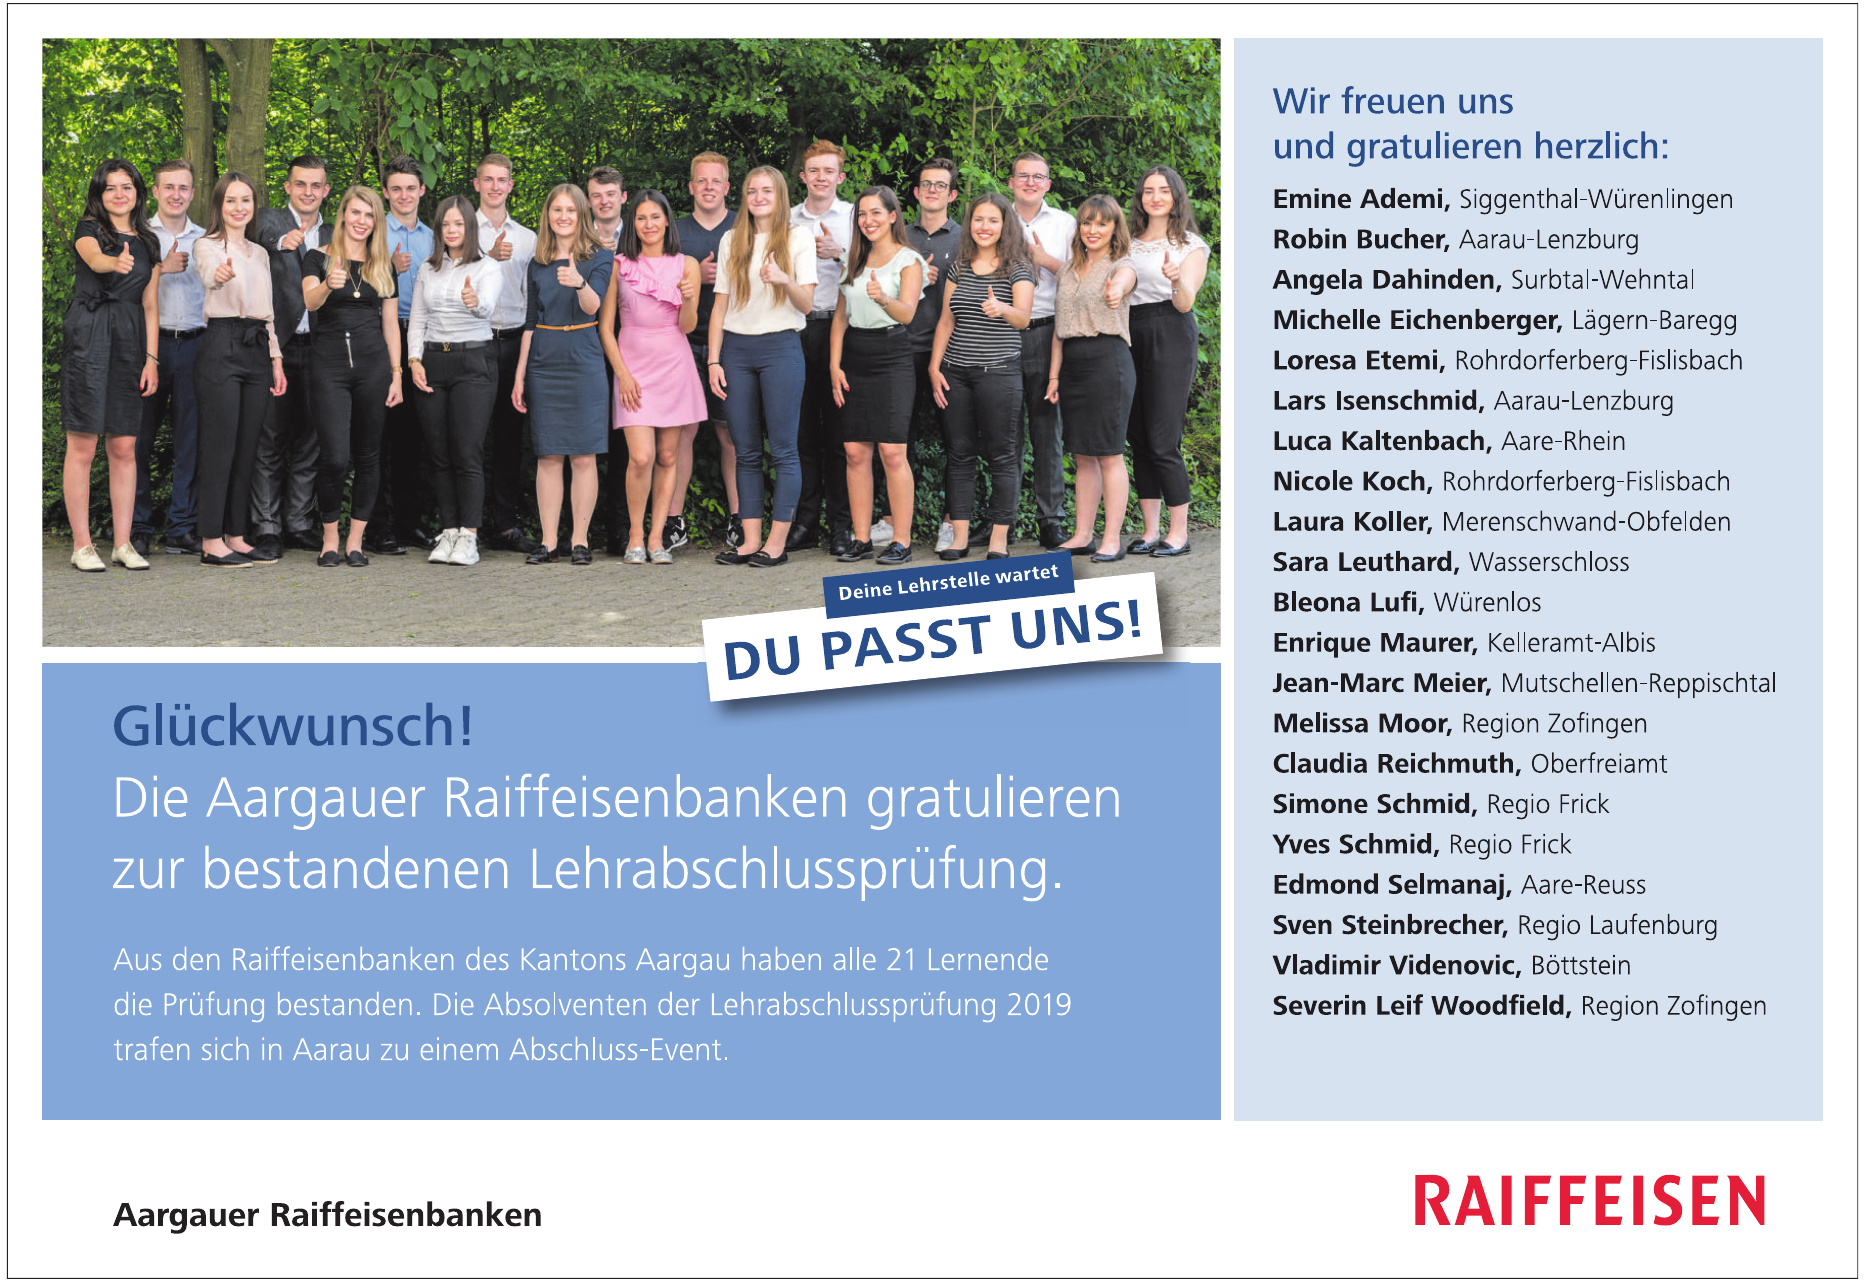 Aargauer Raiffeisenbanken